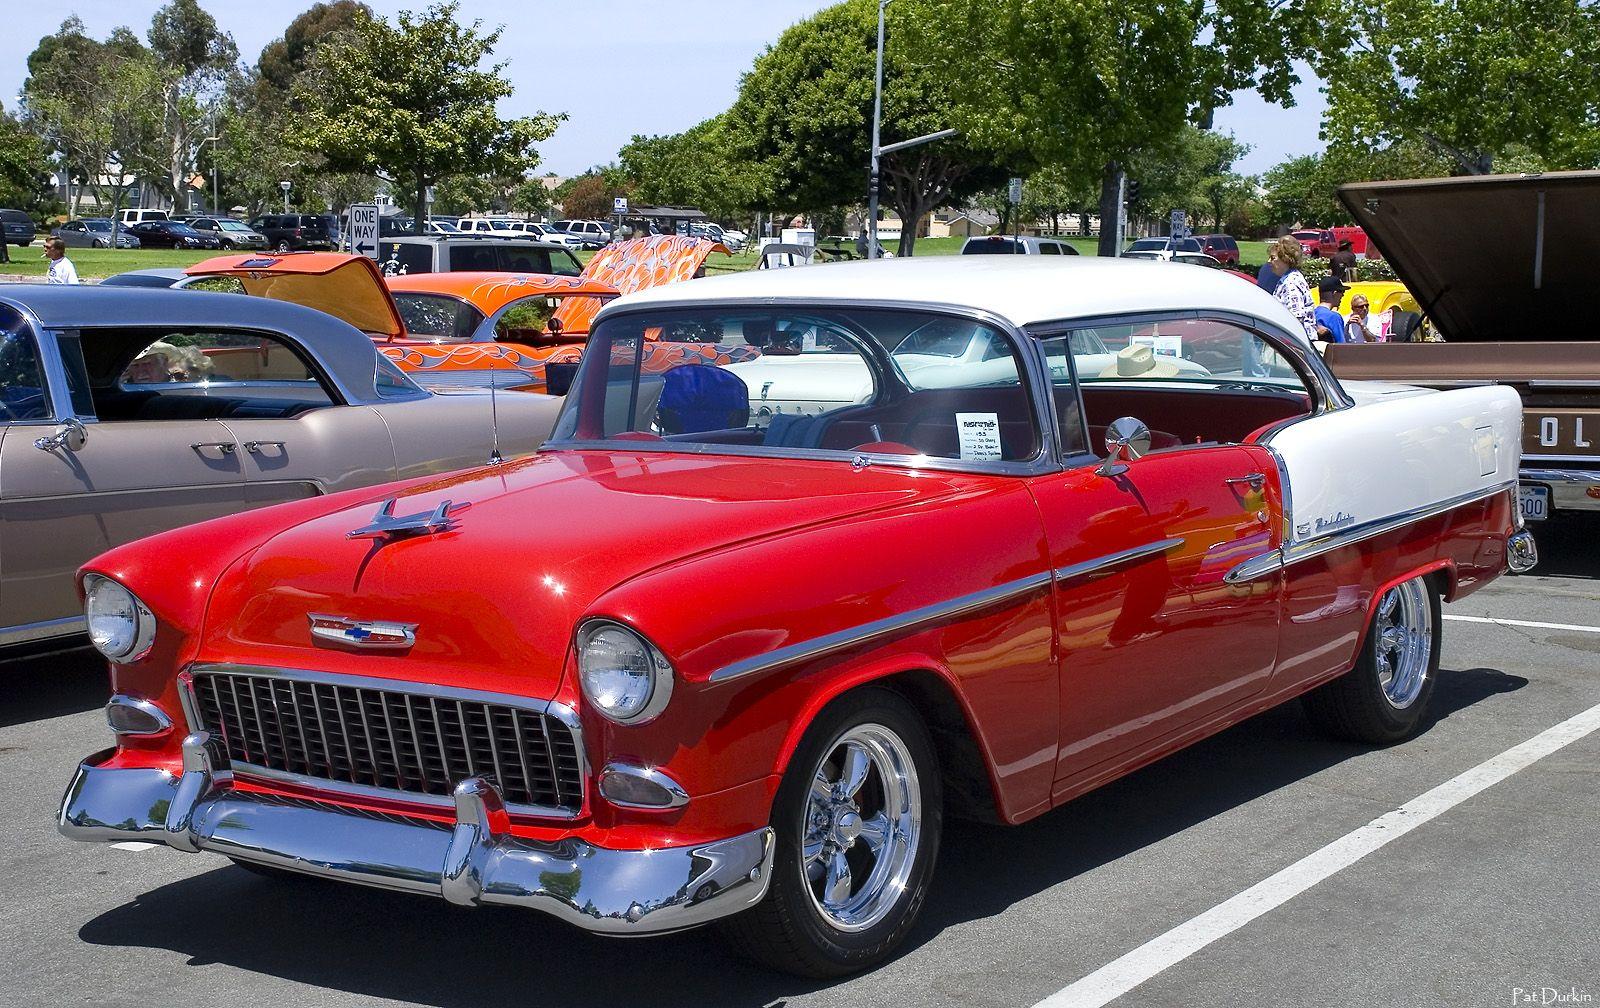 1955 Chevy Chevrolet bel air, 1955 chevrolet ve Chevy